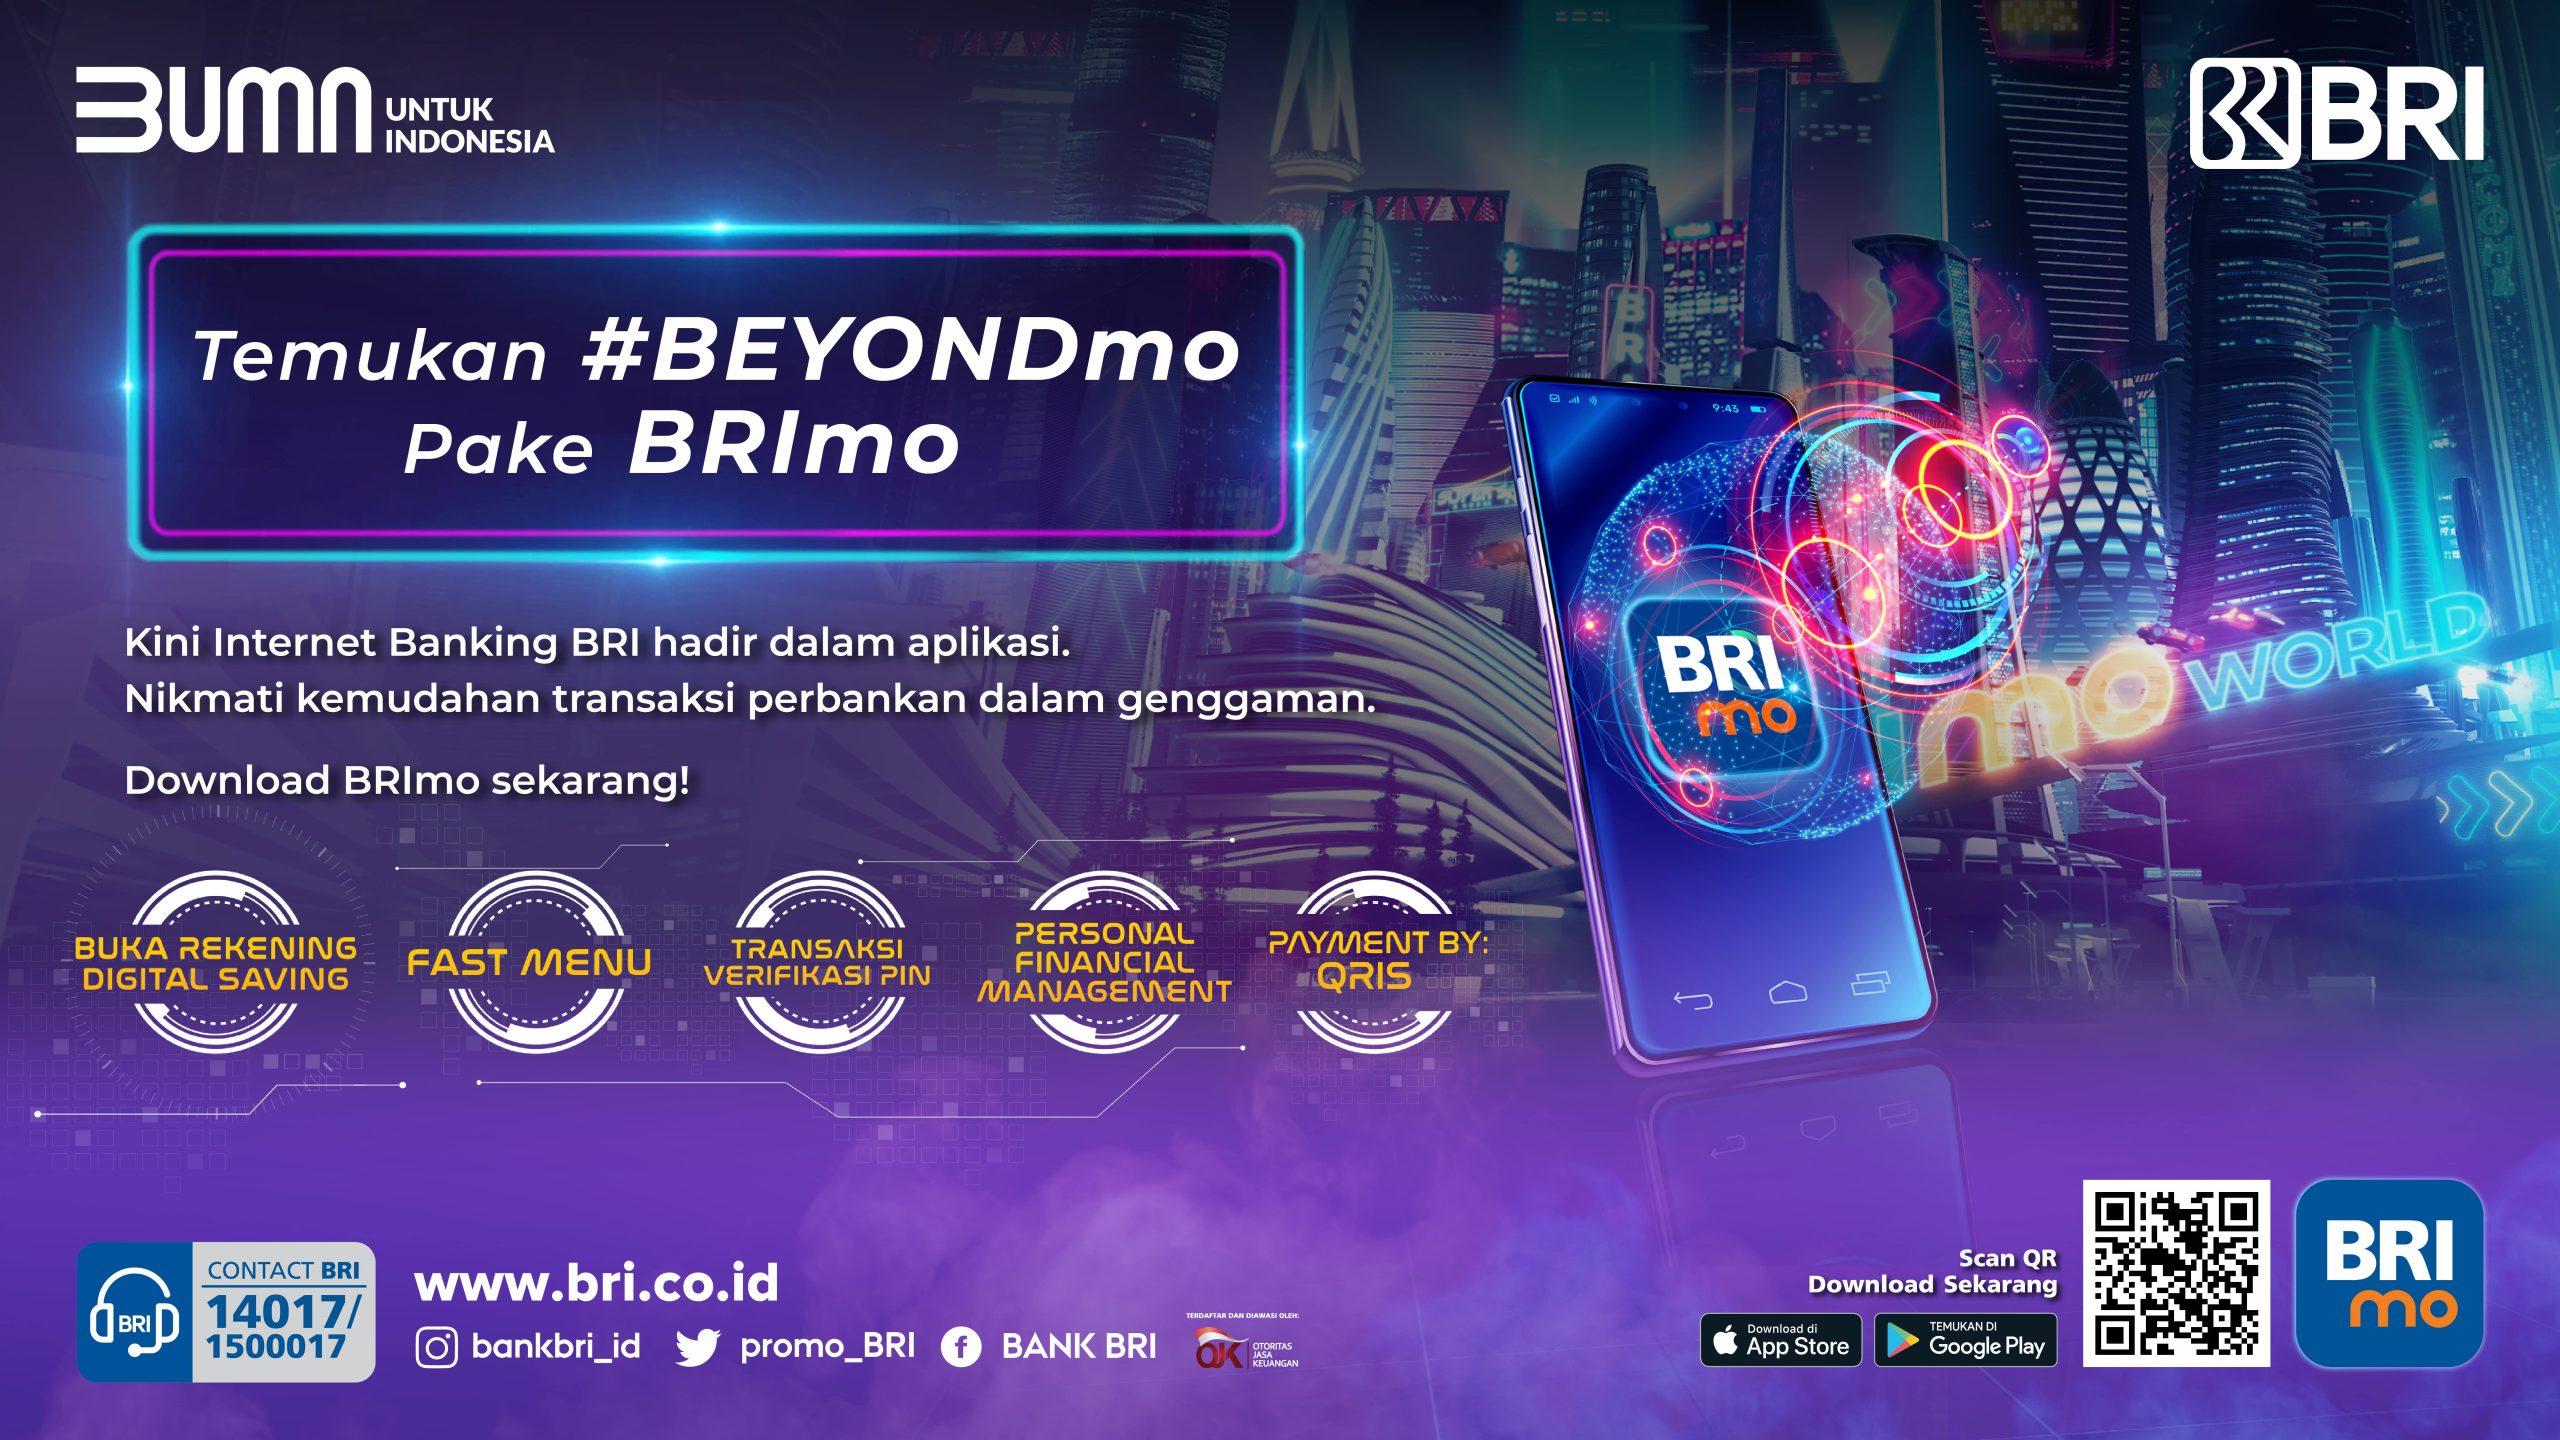 BRImo Noah 1920x1080px-01-min